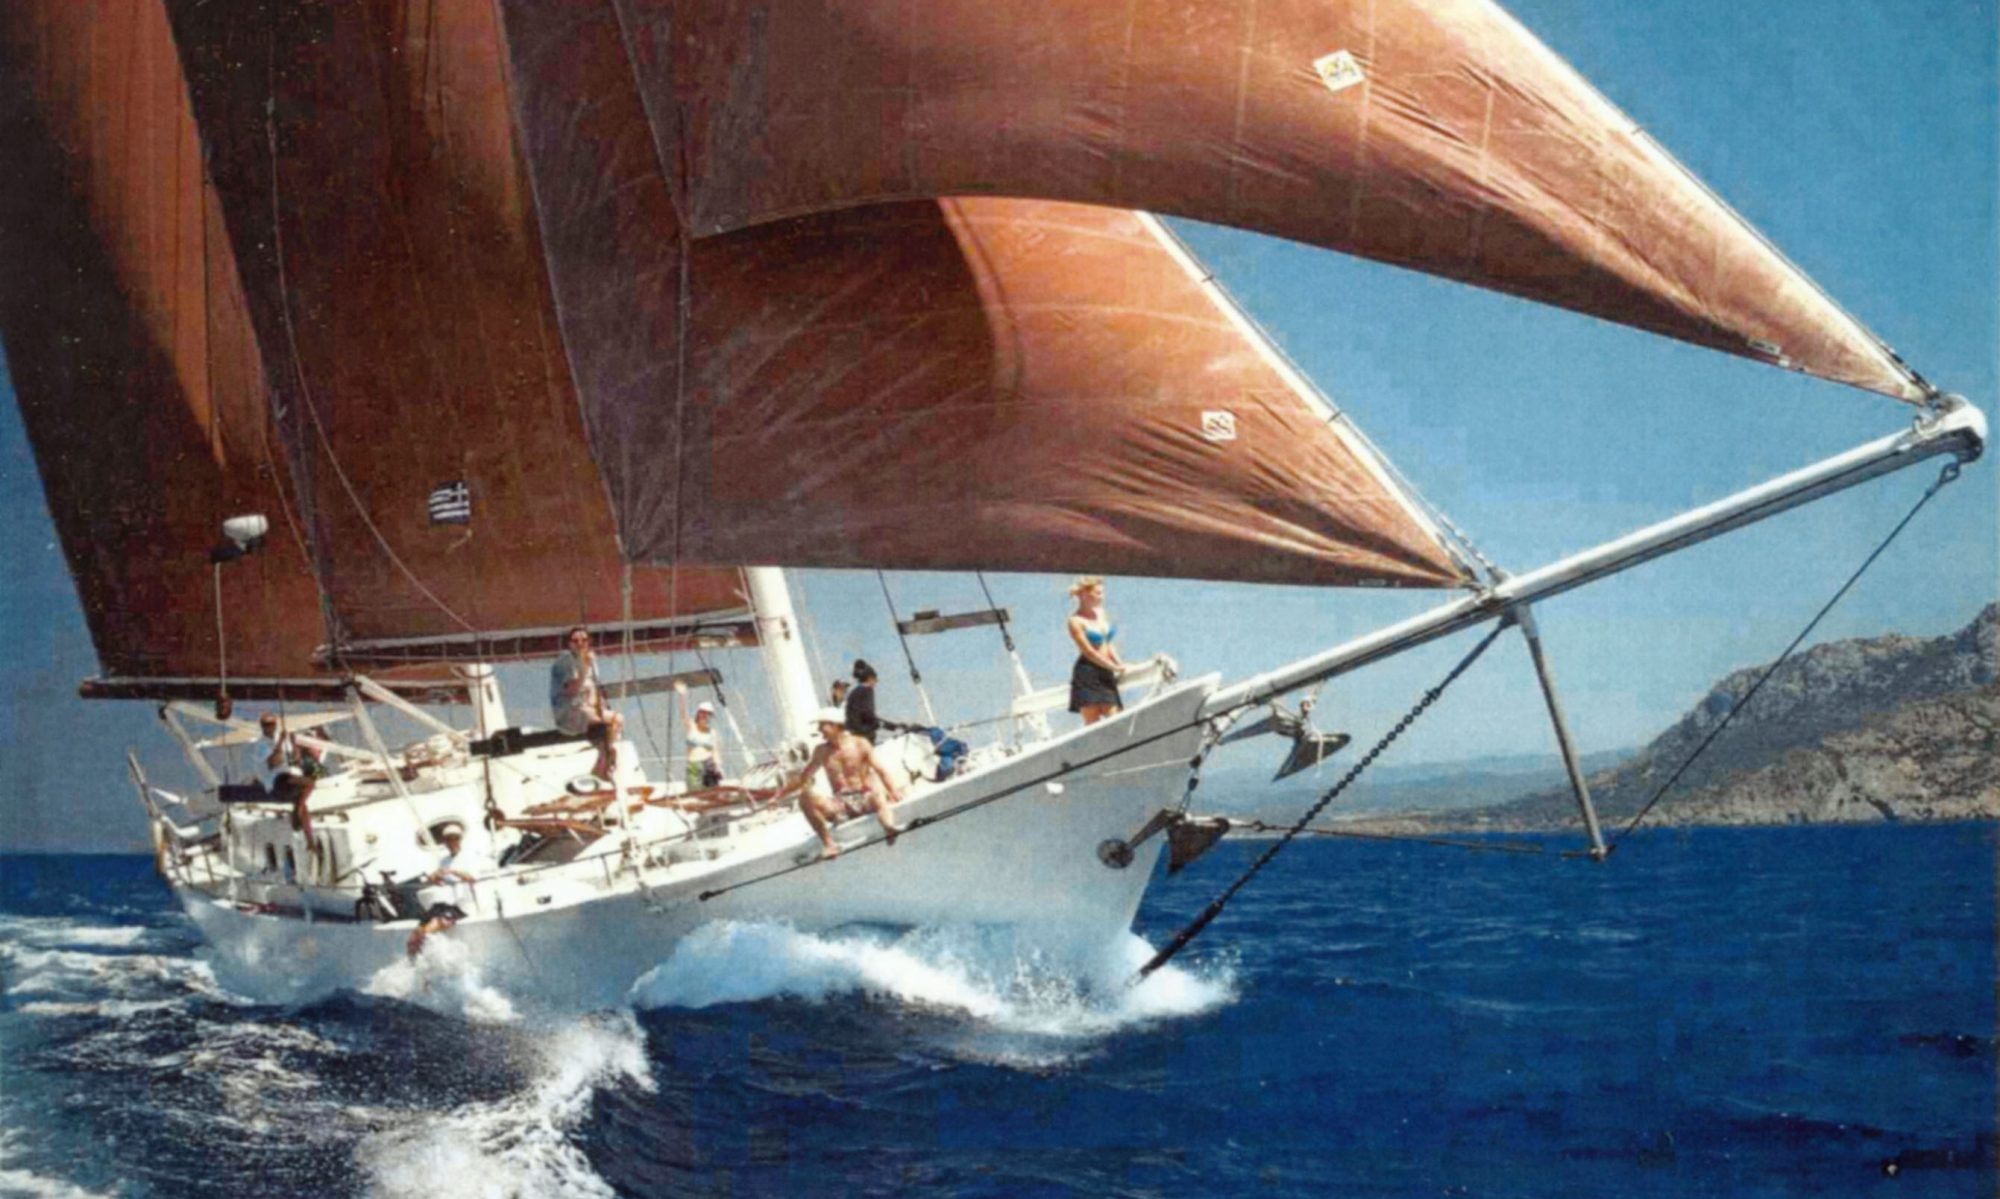 Chris Wren - Sail Training